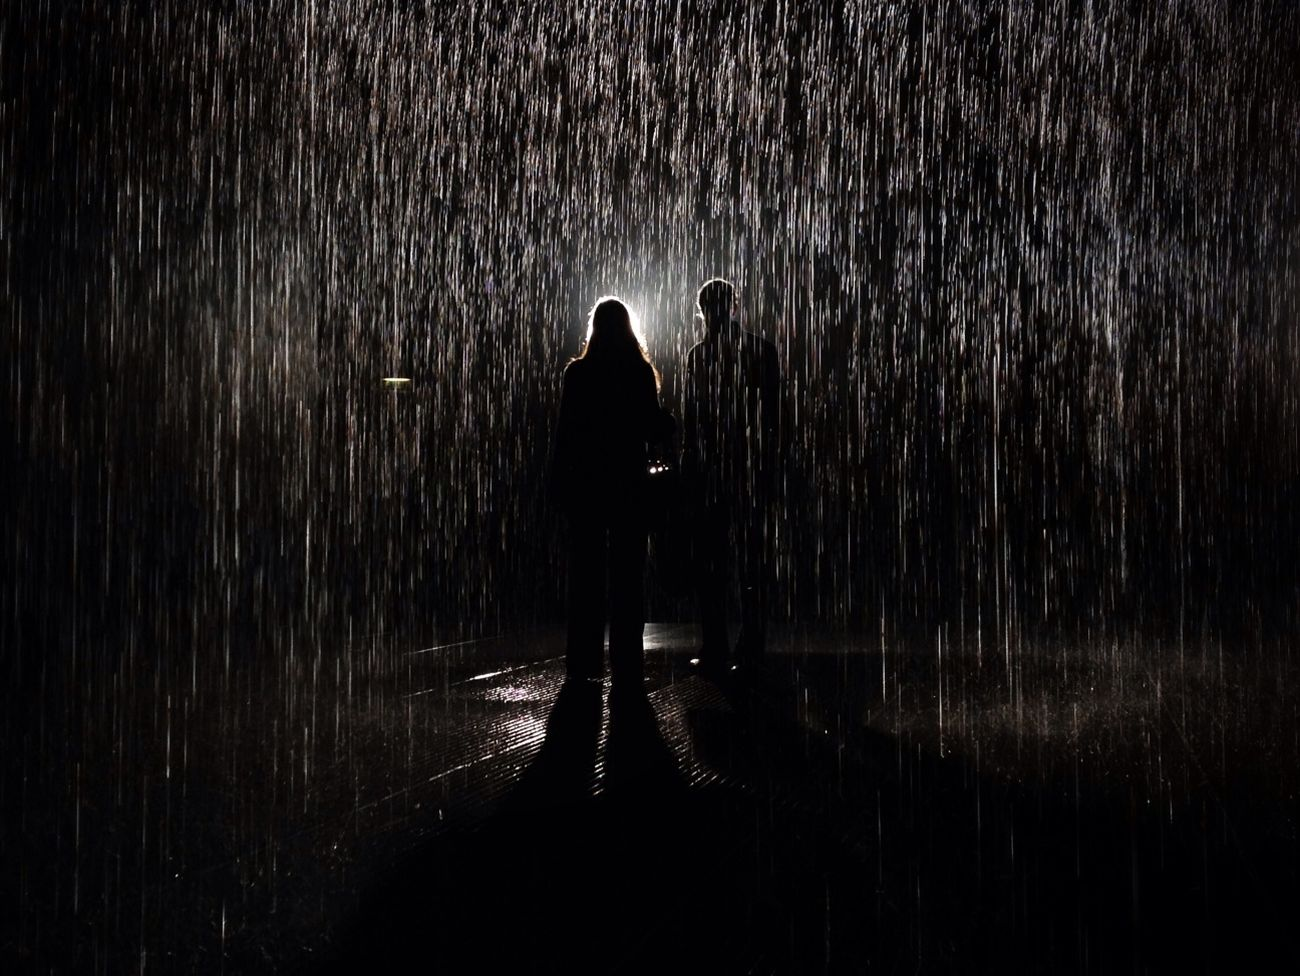 A couple walk through Random International's Rain Room at the Barbican Centre in London